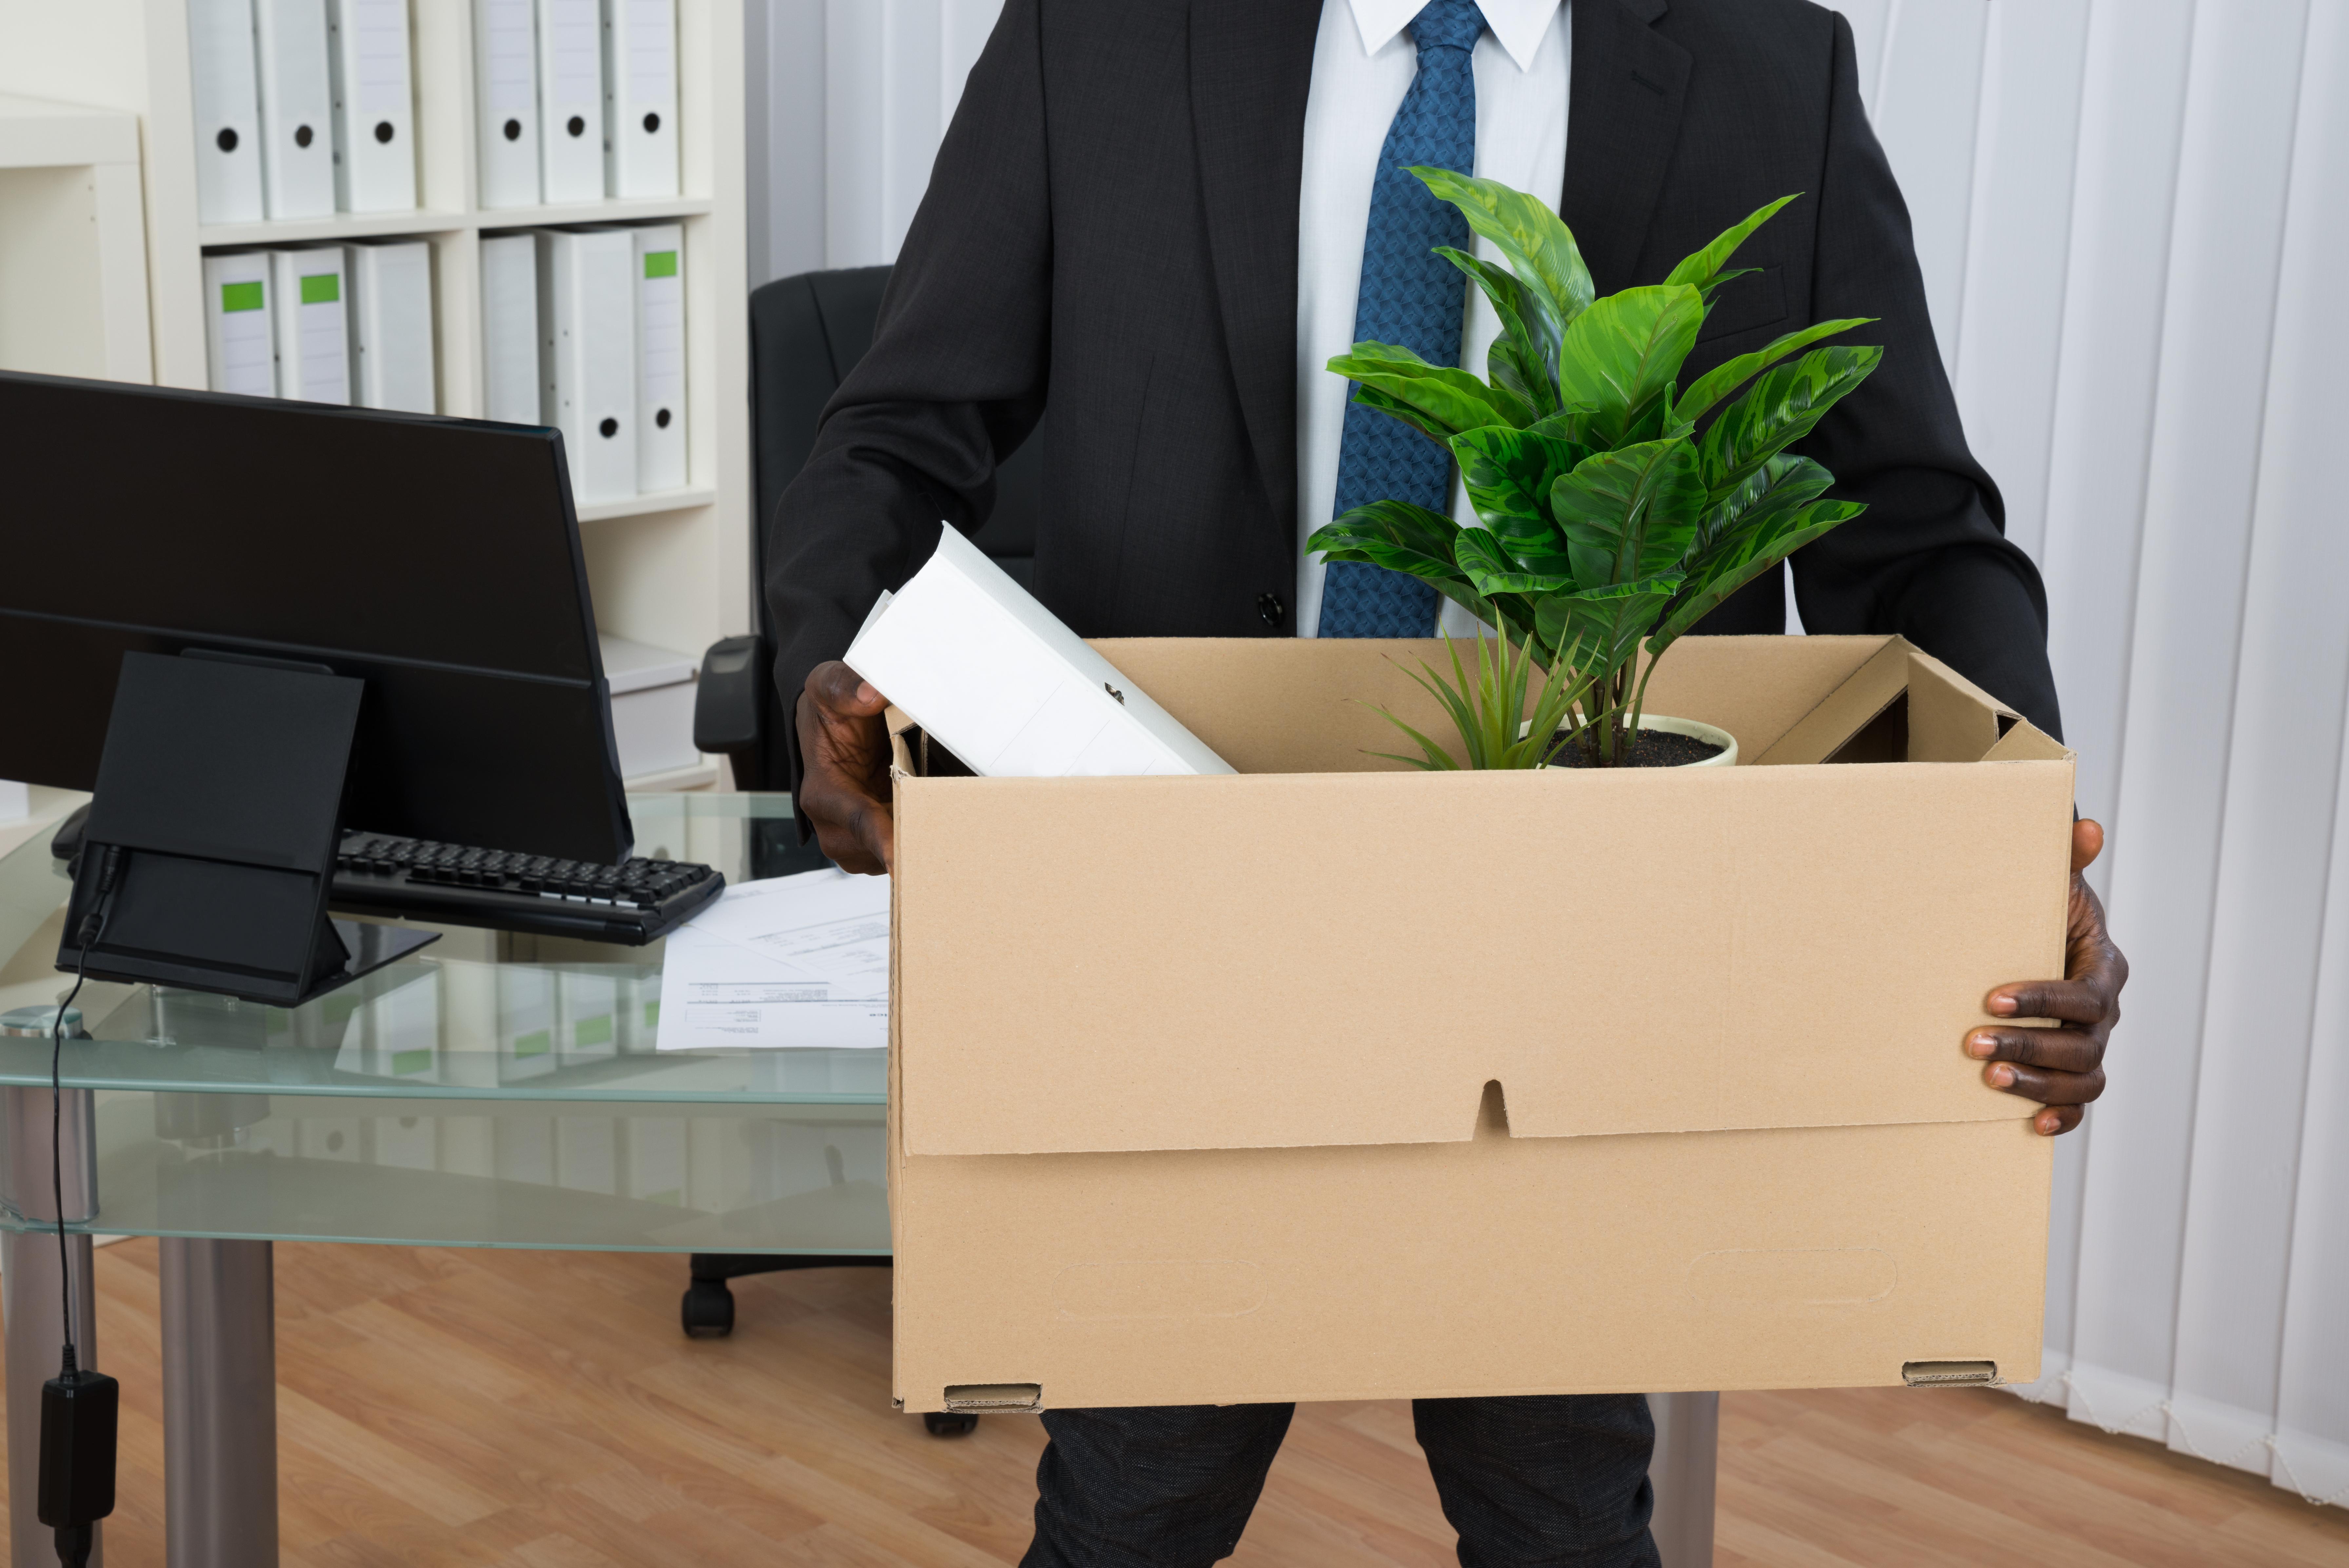 Businessman Holding Folder And Plant In Cardboard Box